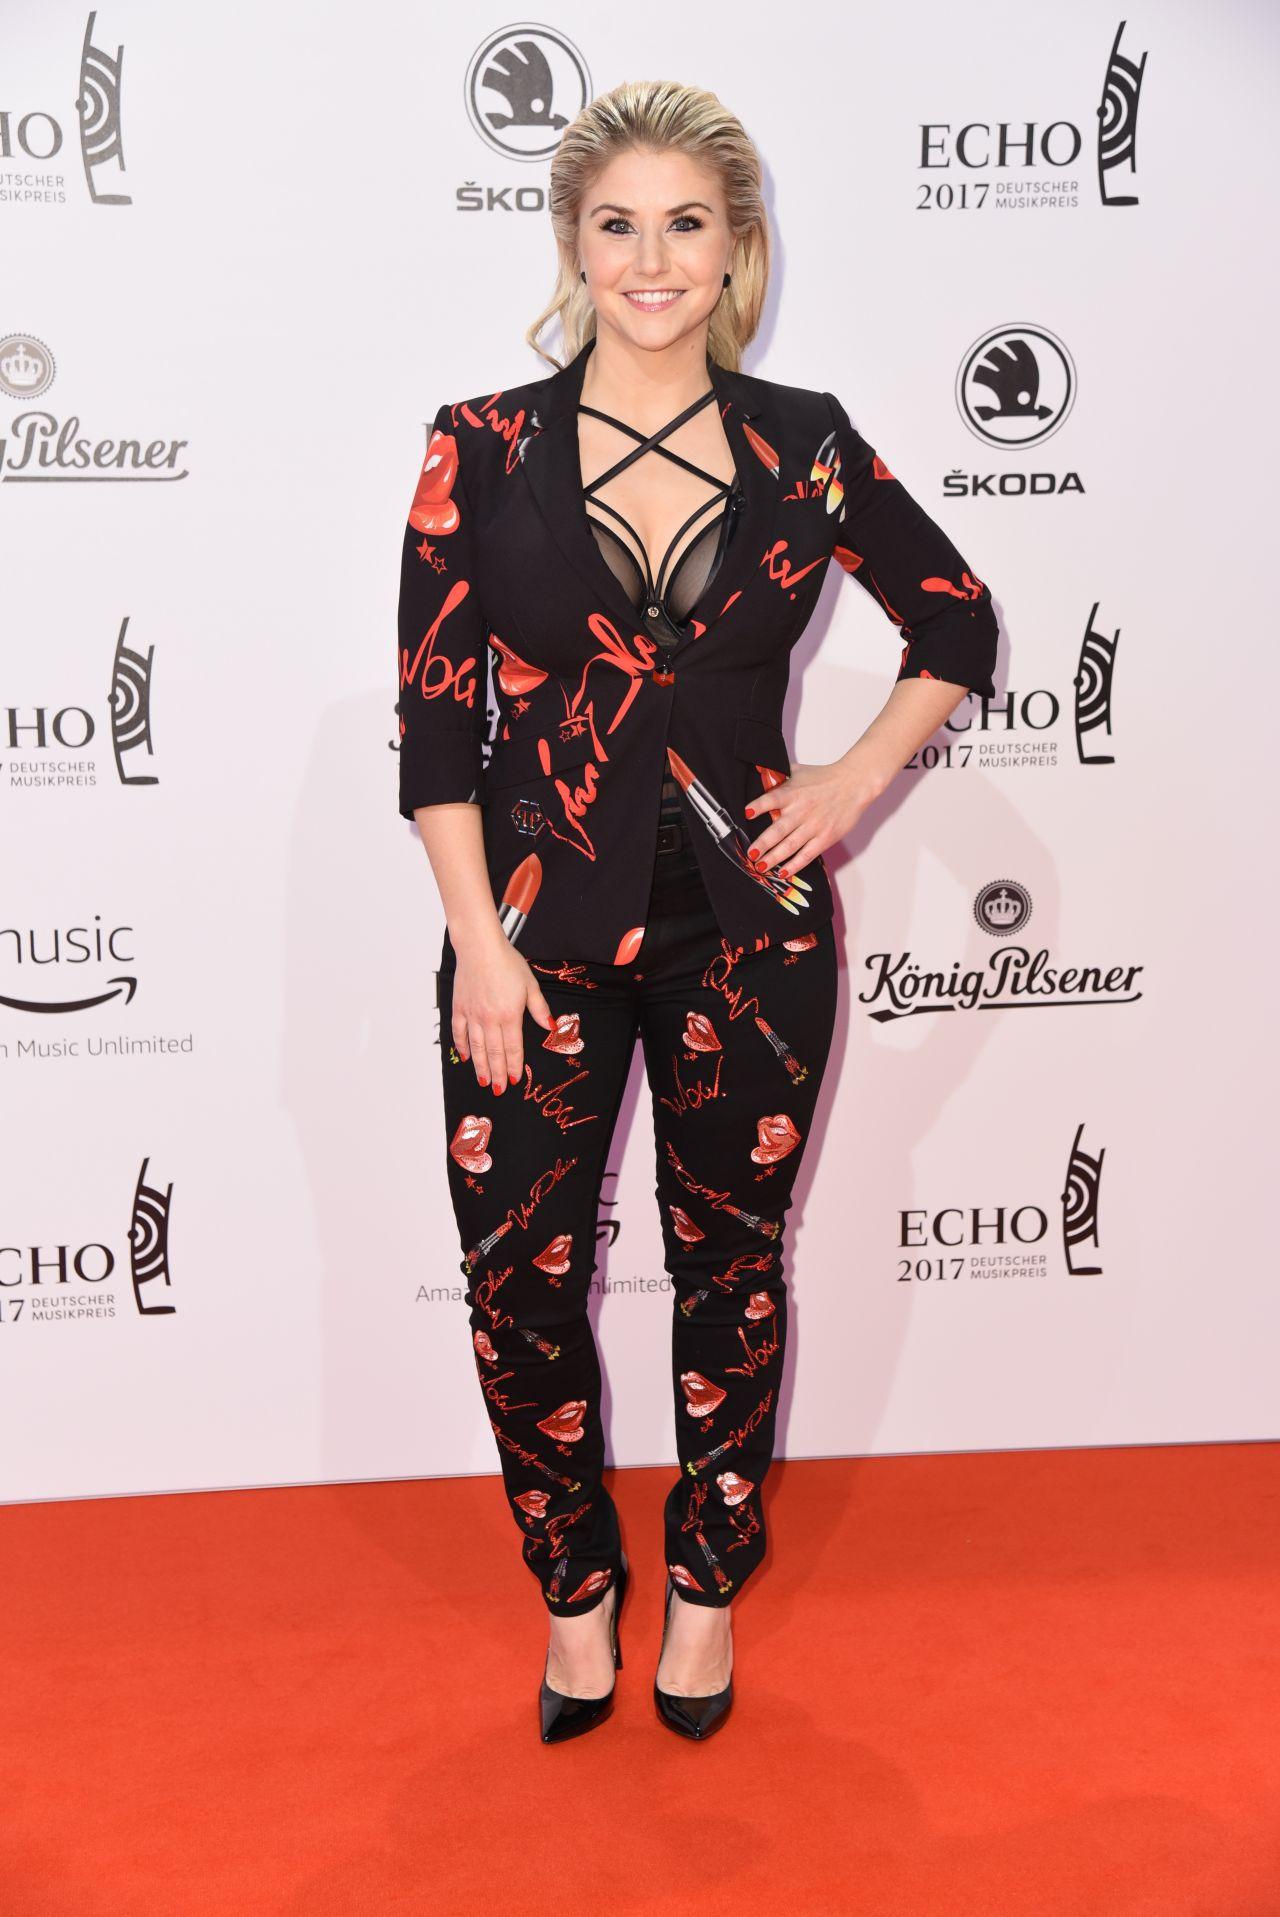 Beatrice Egli at ECHO Music Awards 2017 in Berlin